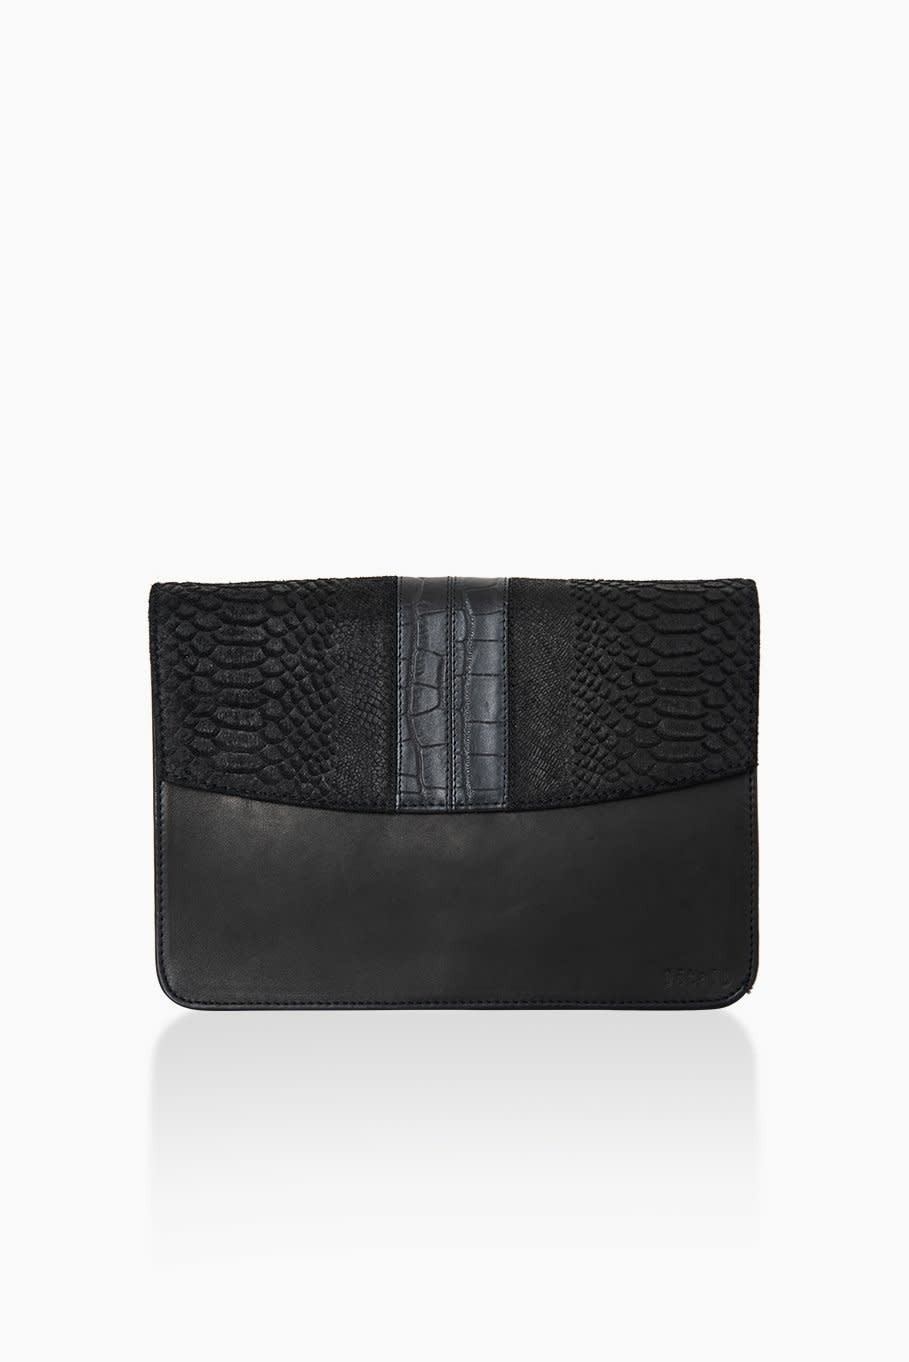 Détail Detail Harmony handbag Black anaconda 27.5 x 9 x 20 cm